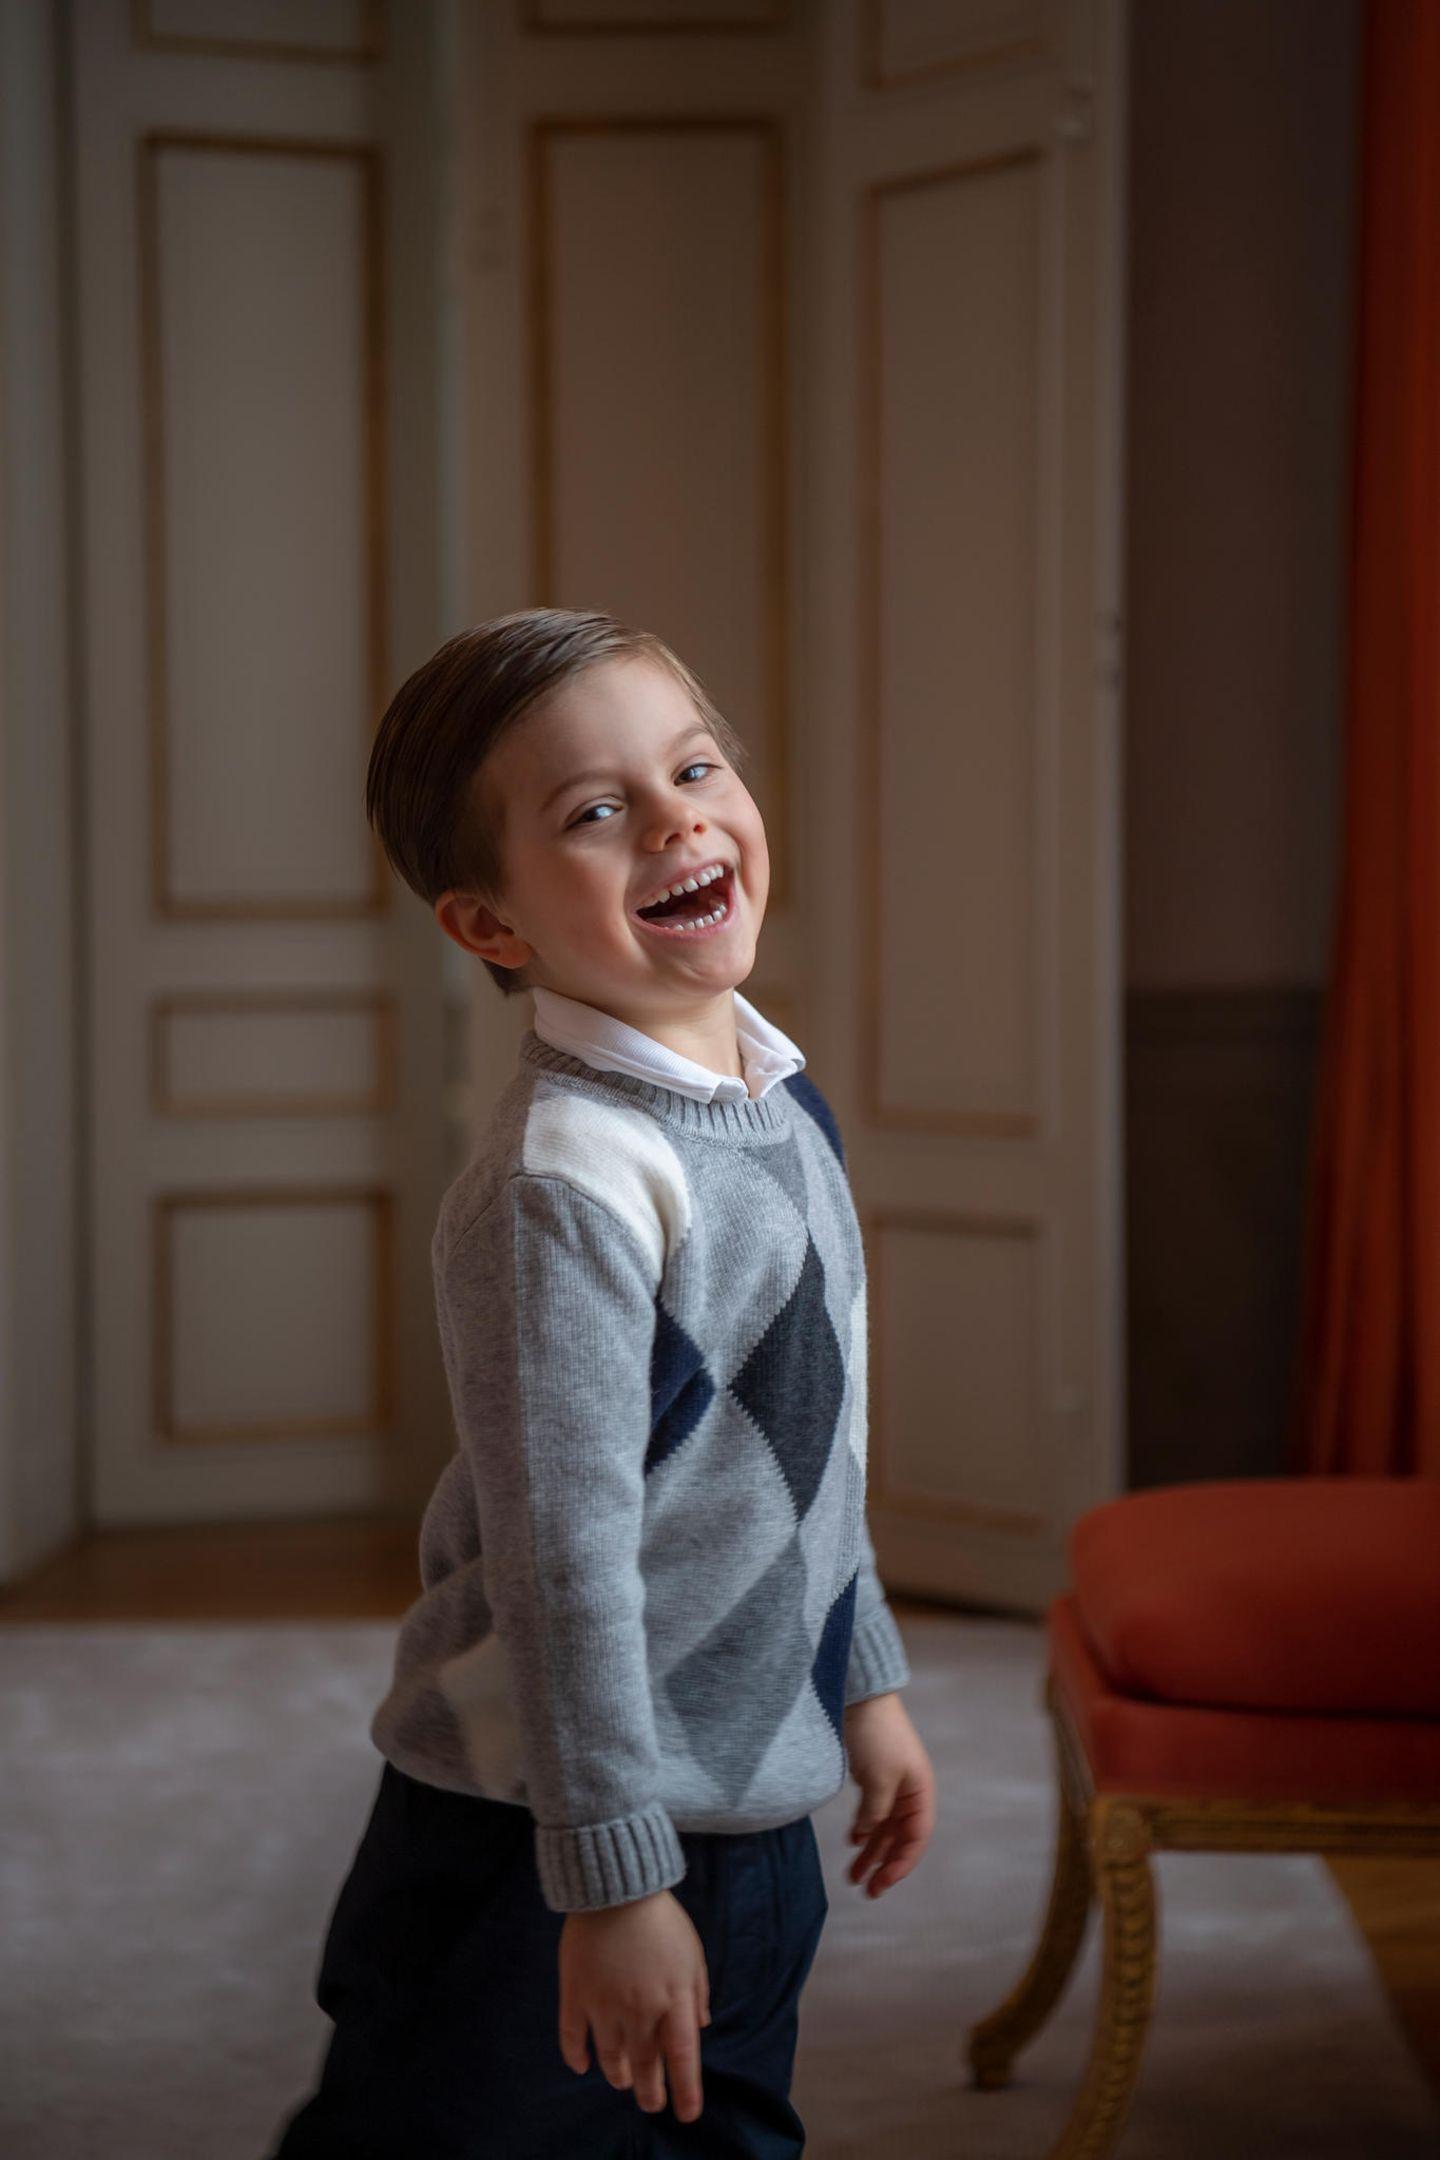 Royale Kinderfotos: Prinz Oskar lacht